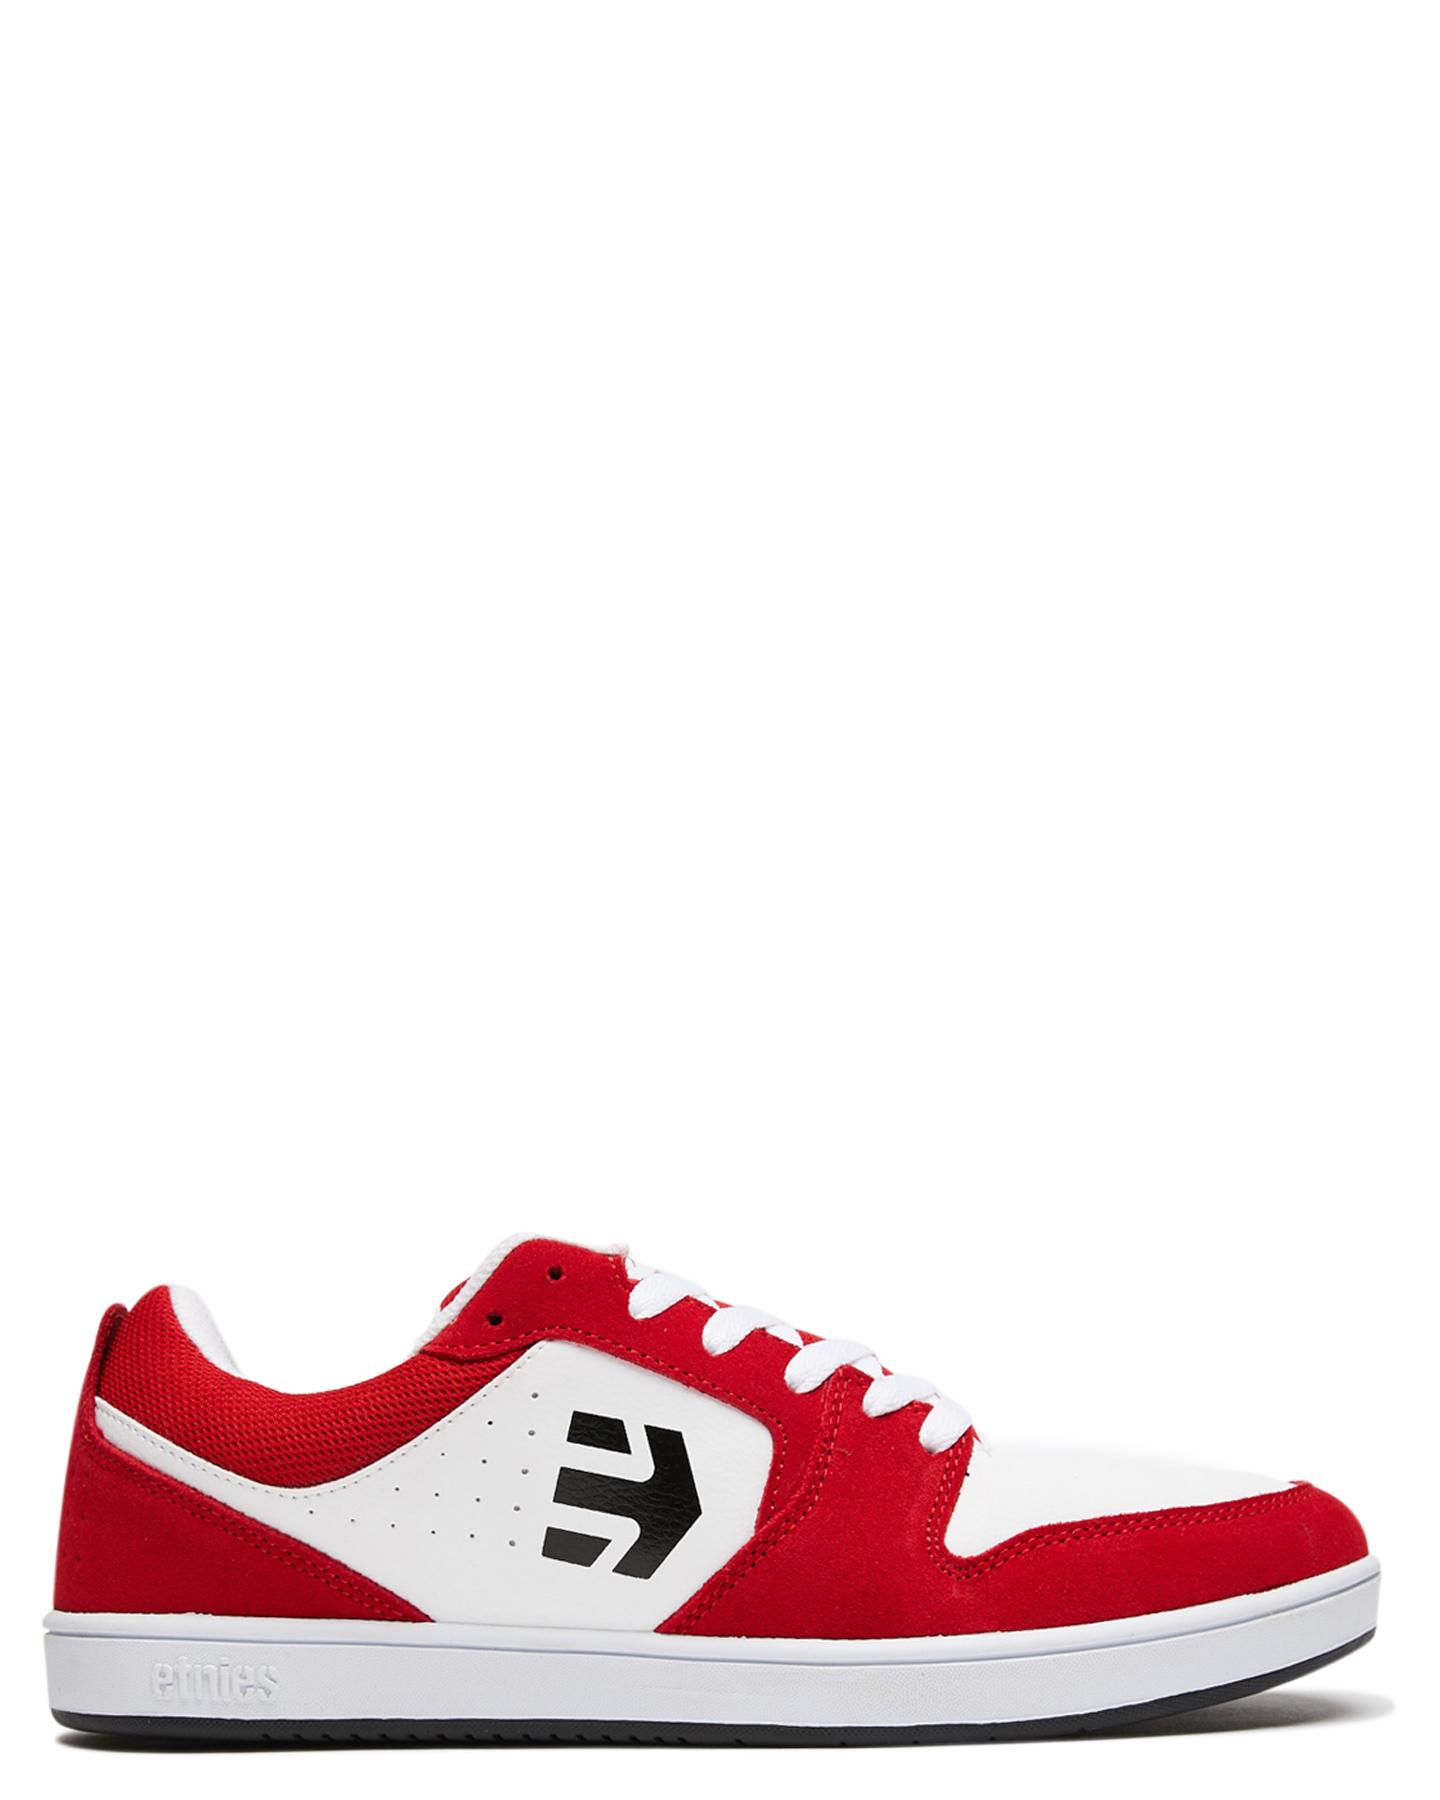 Etnies Mens Verano Shoe Red White